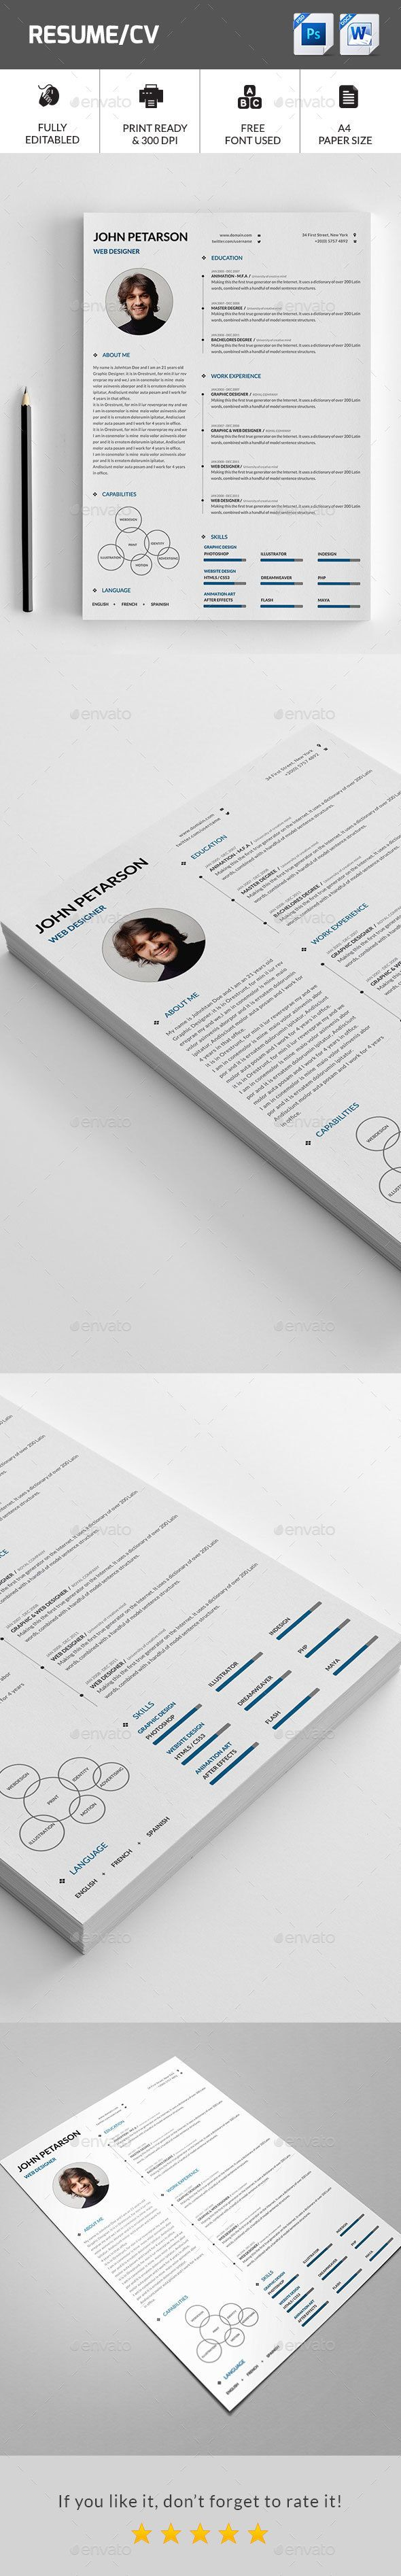 19 best resume images on pinterest